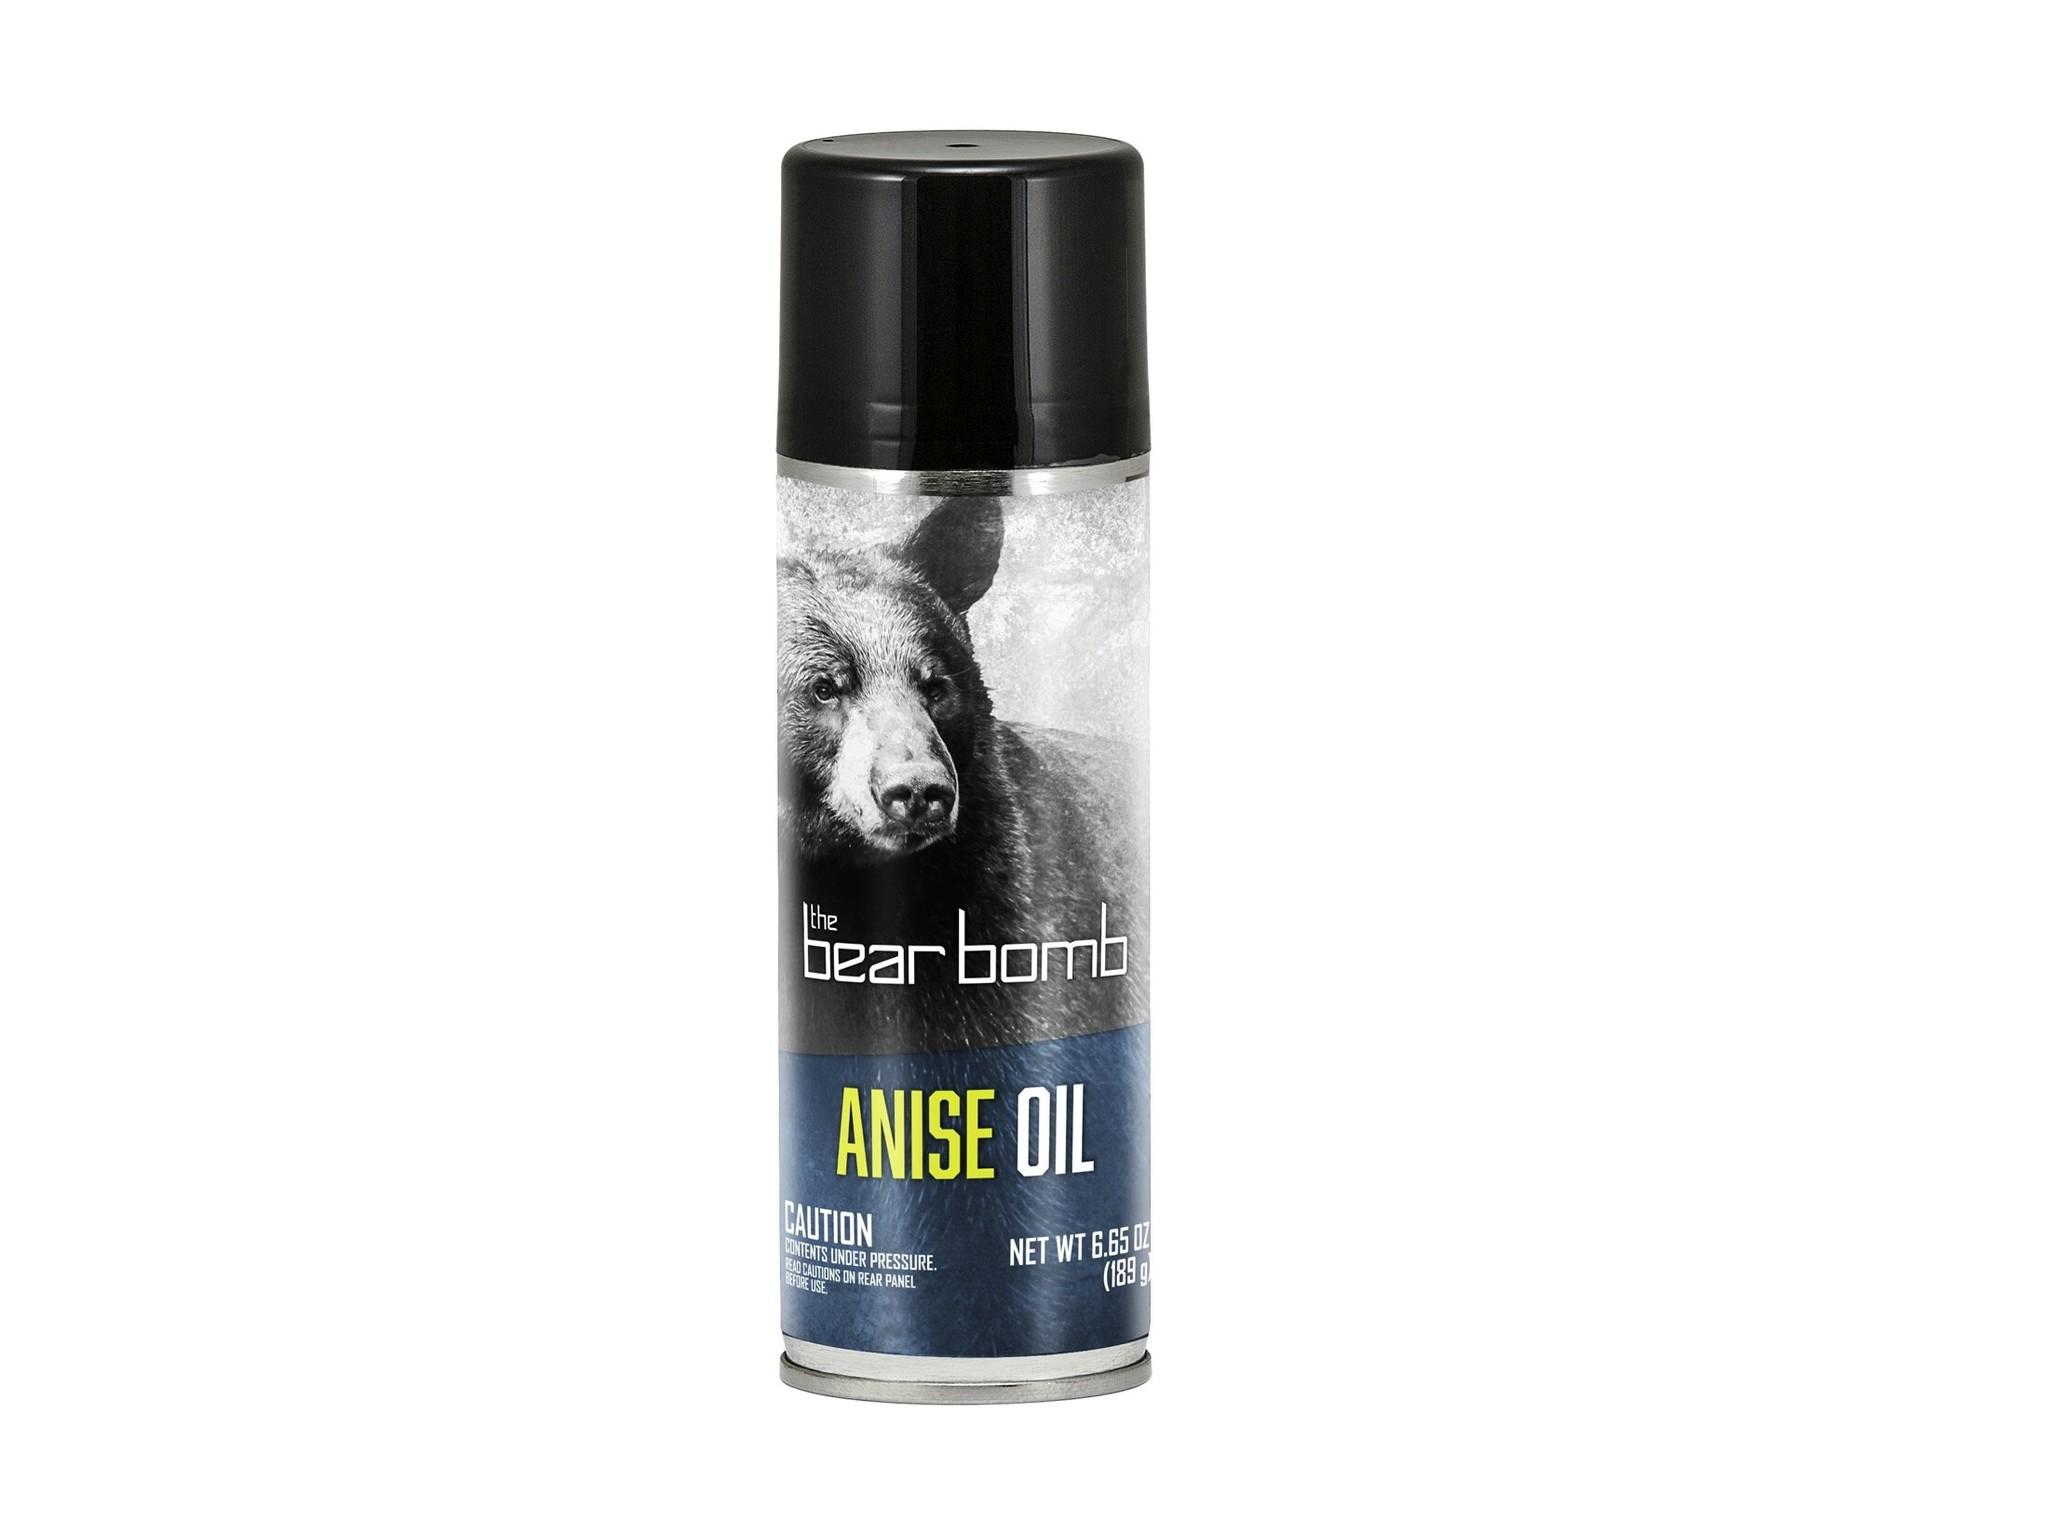 Buck Bomb Bear Bomb Anise Oil Scent Fogger 5oz